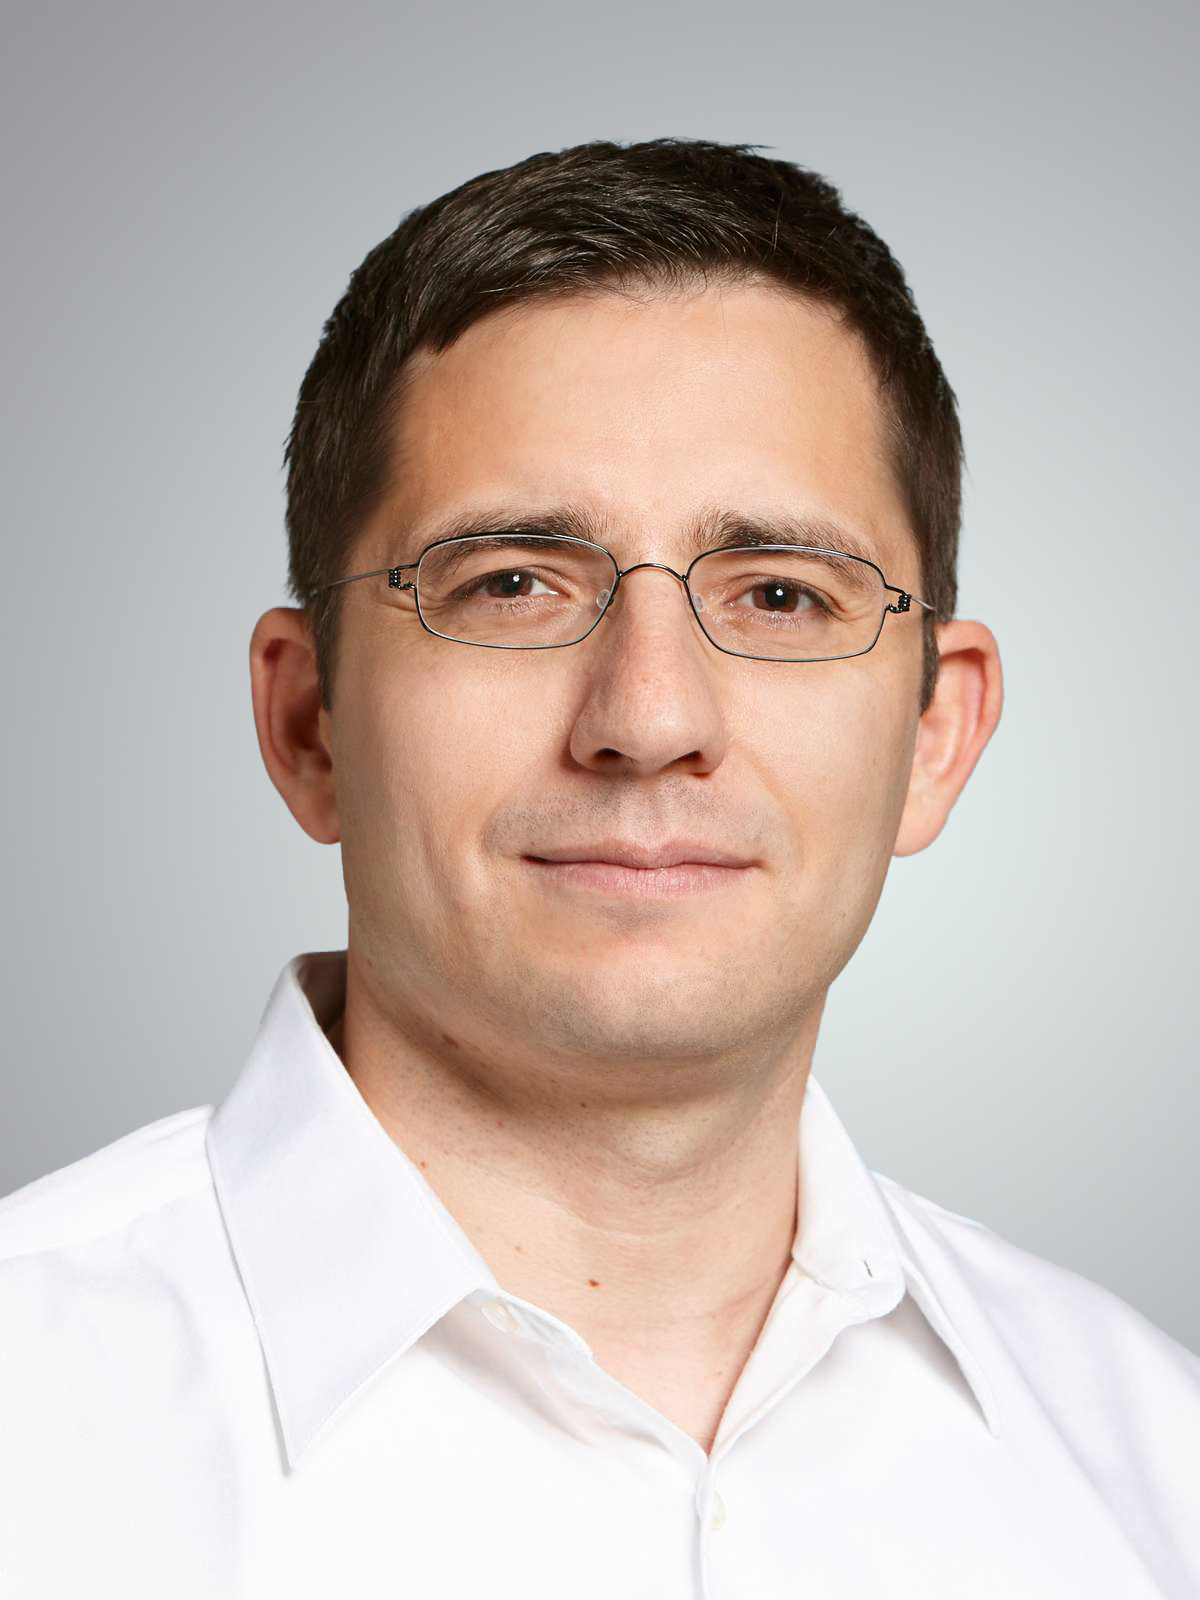 Martin Vechev